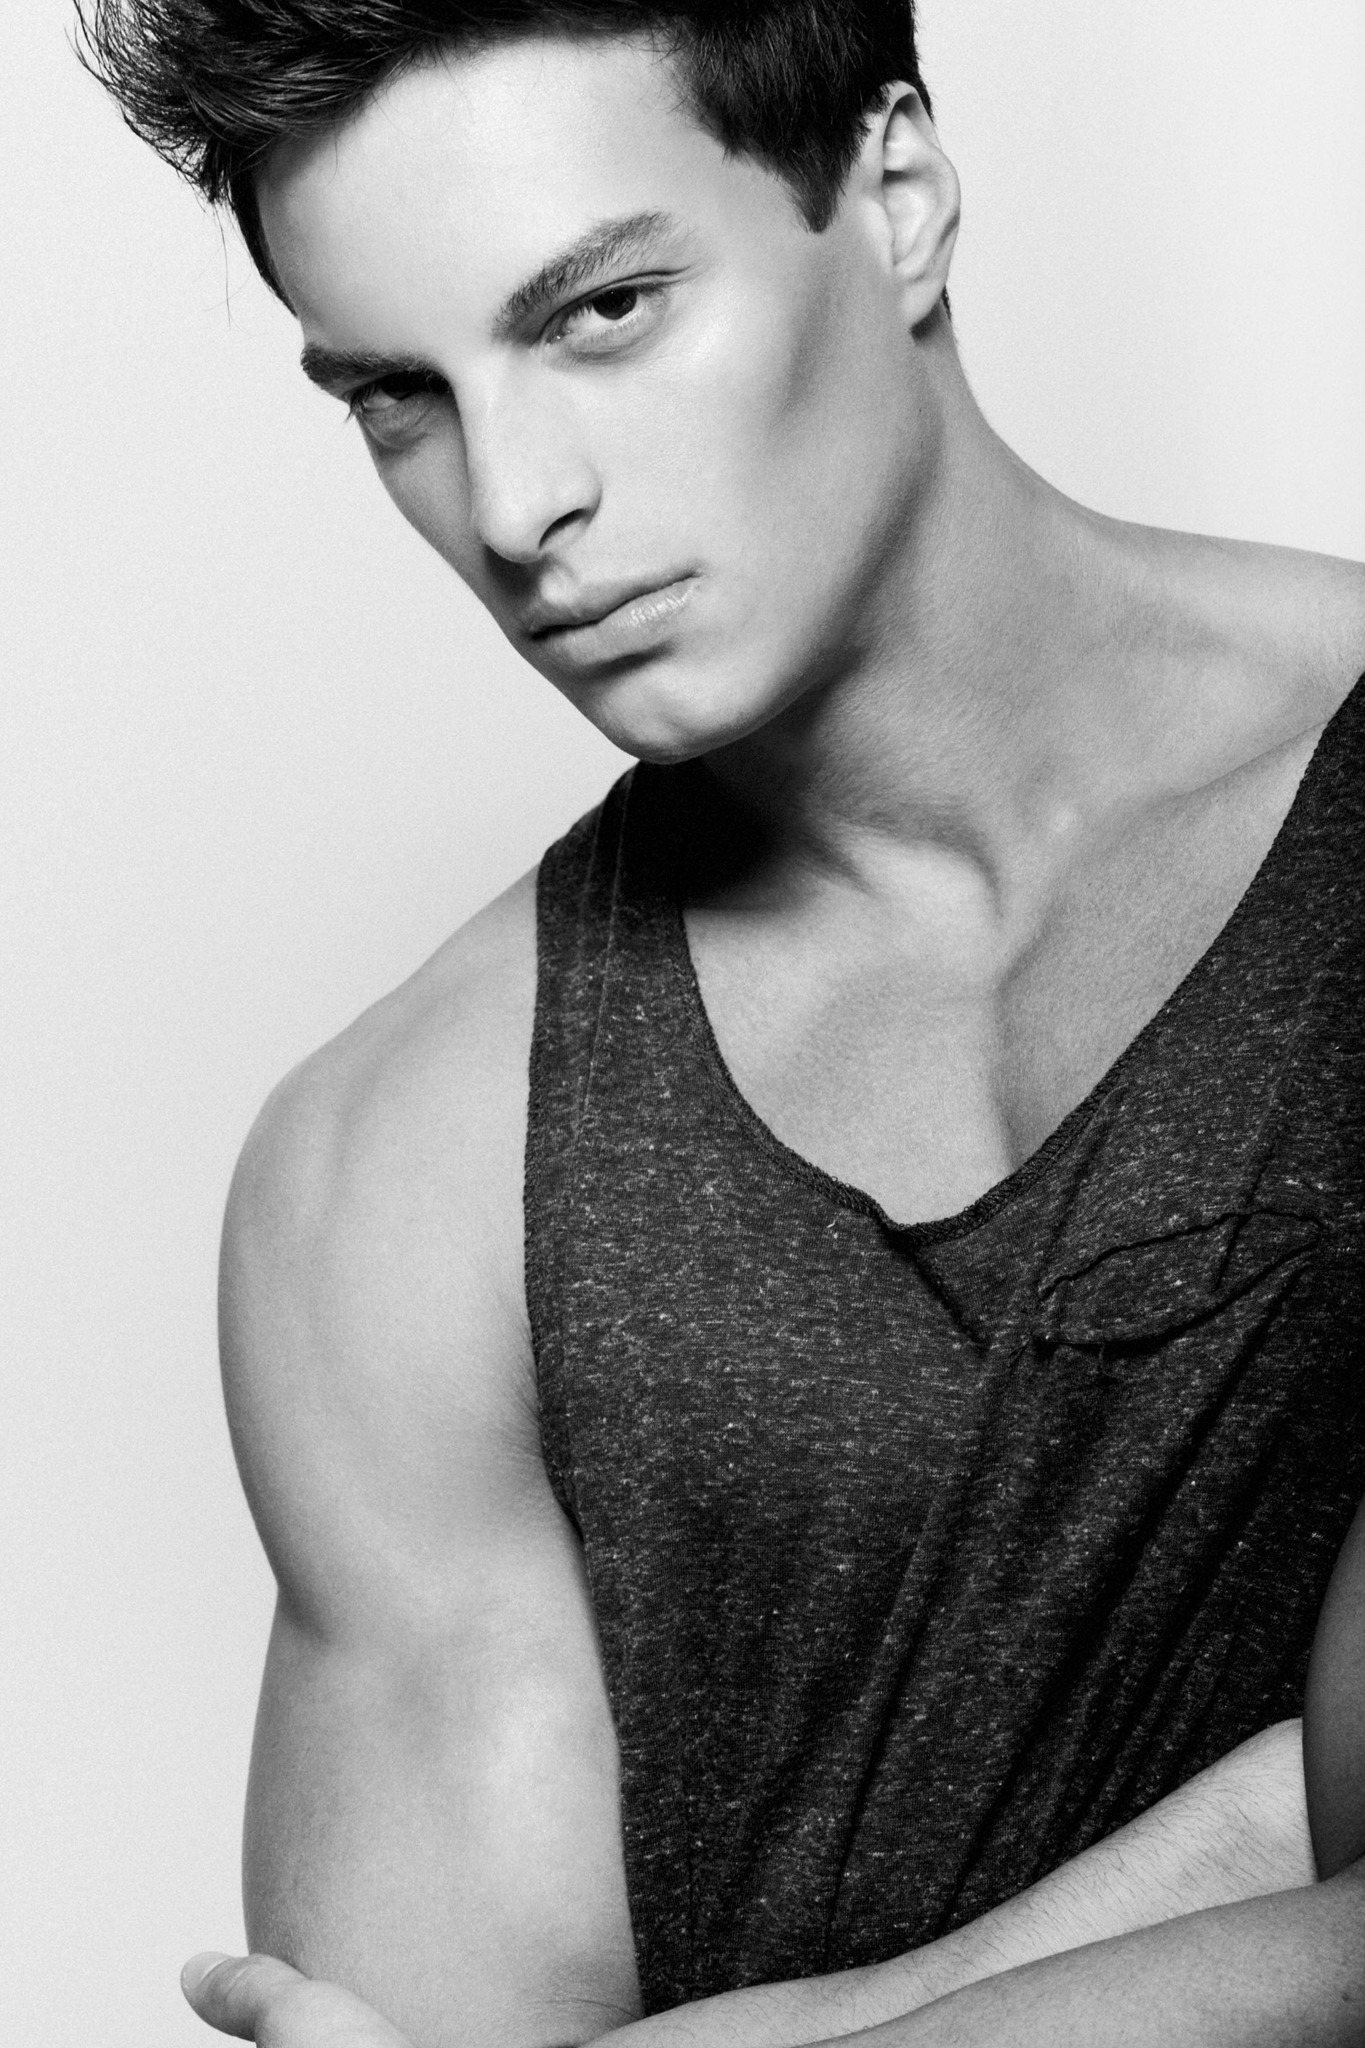 nyc-photographers-male-model-test-10027.jpg